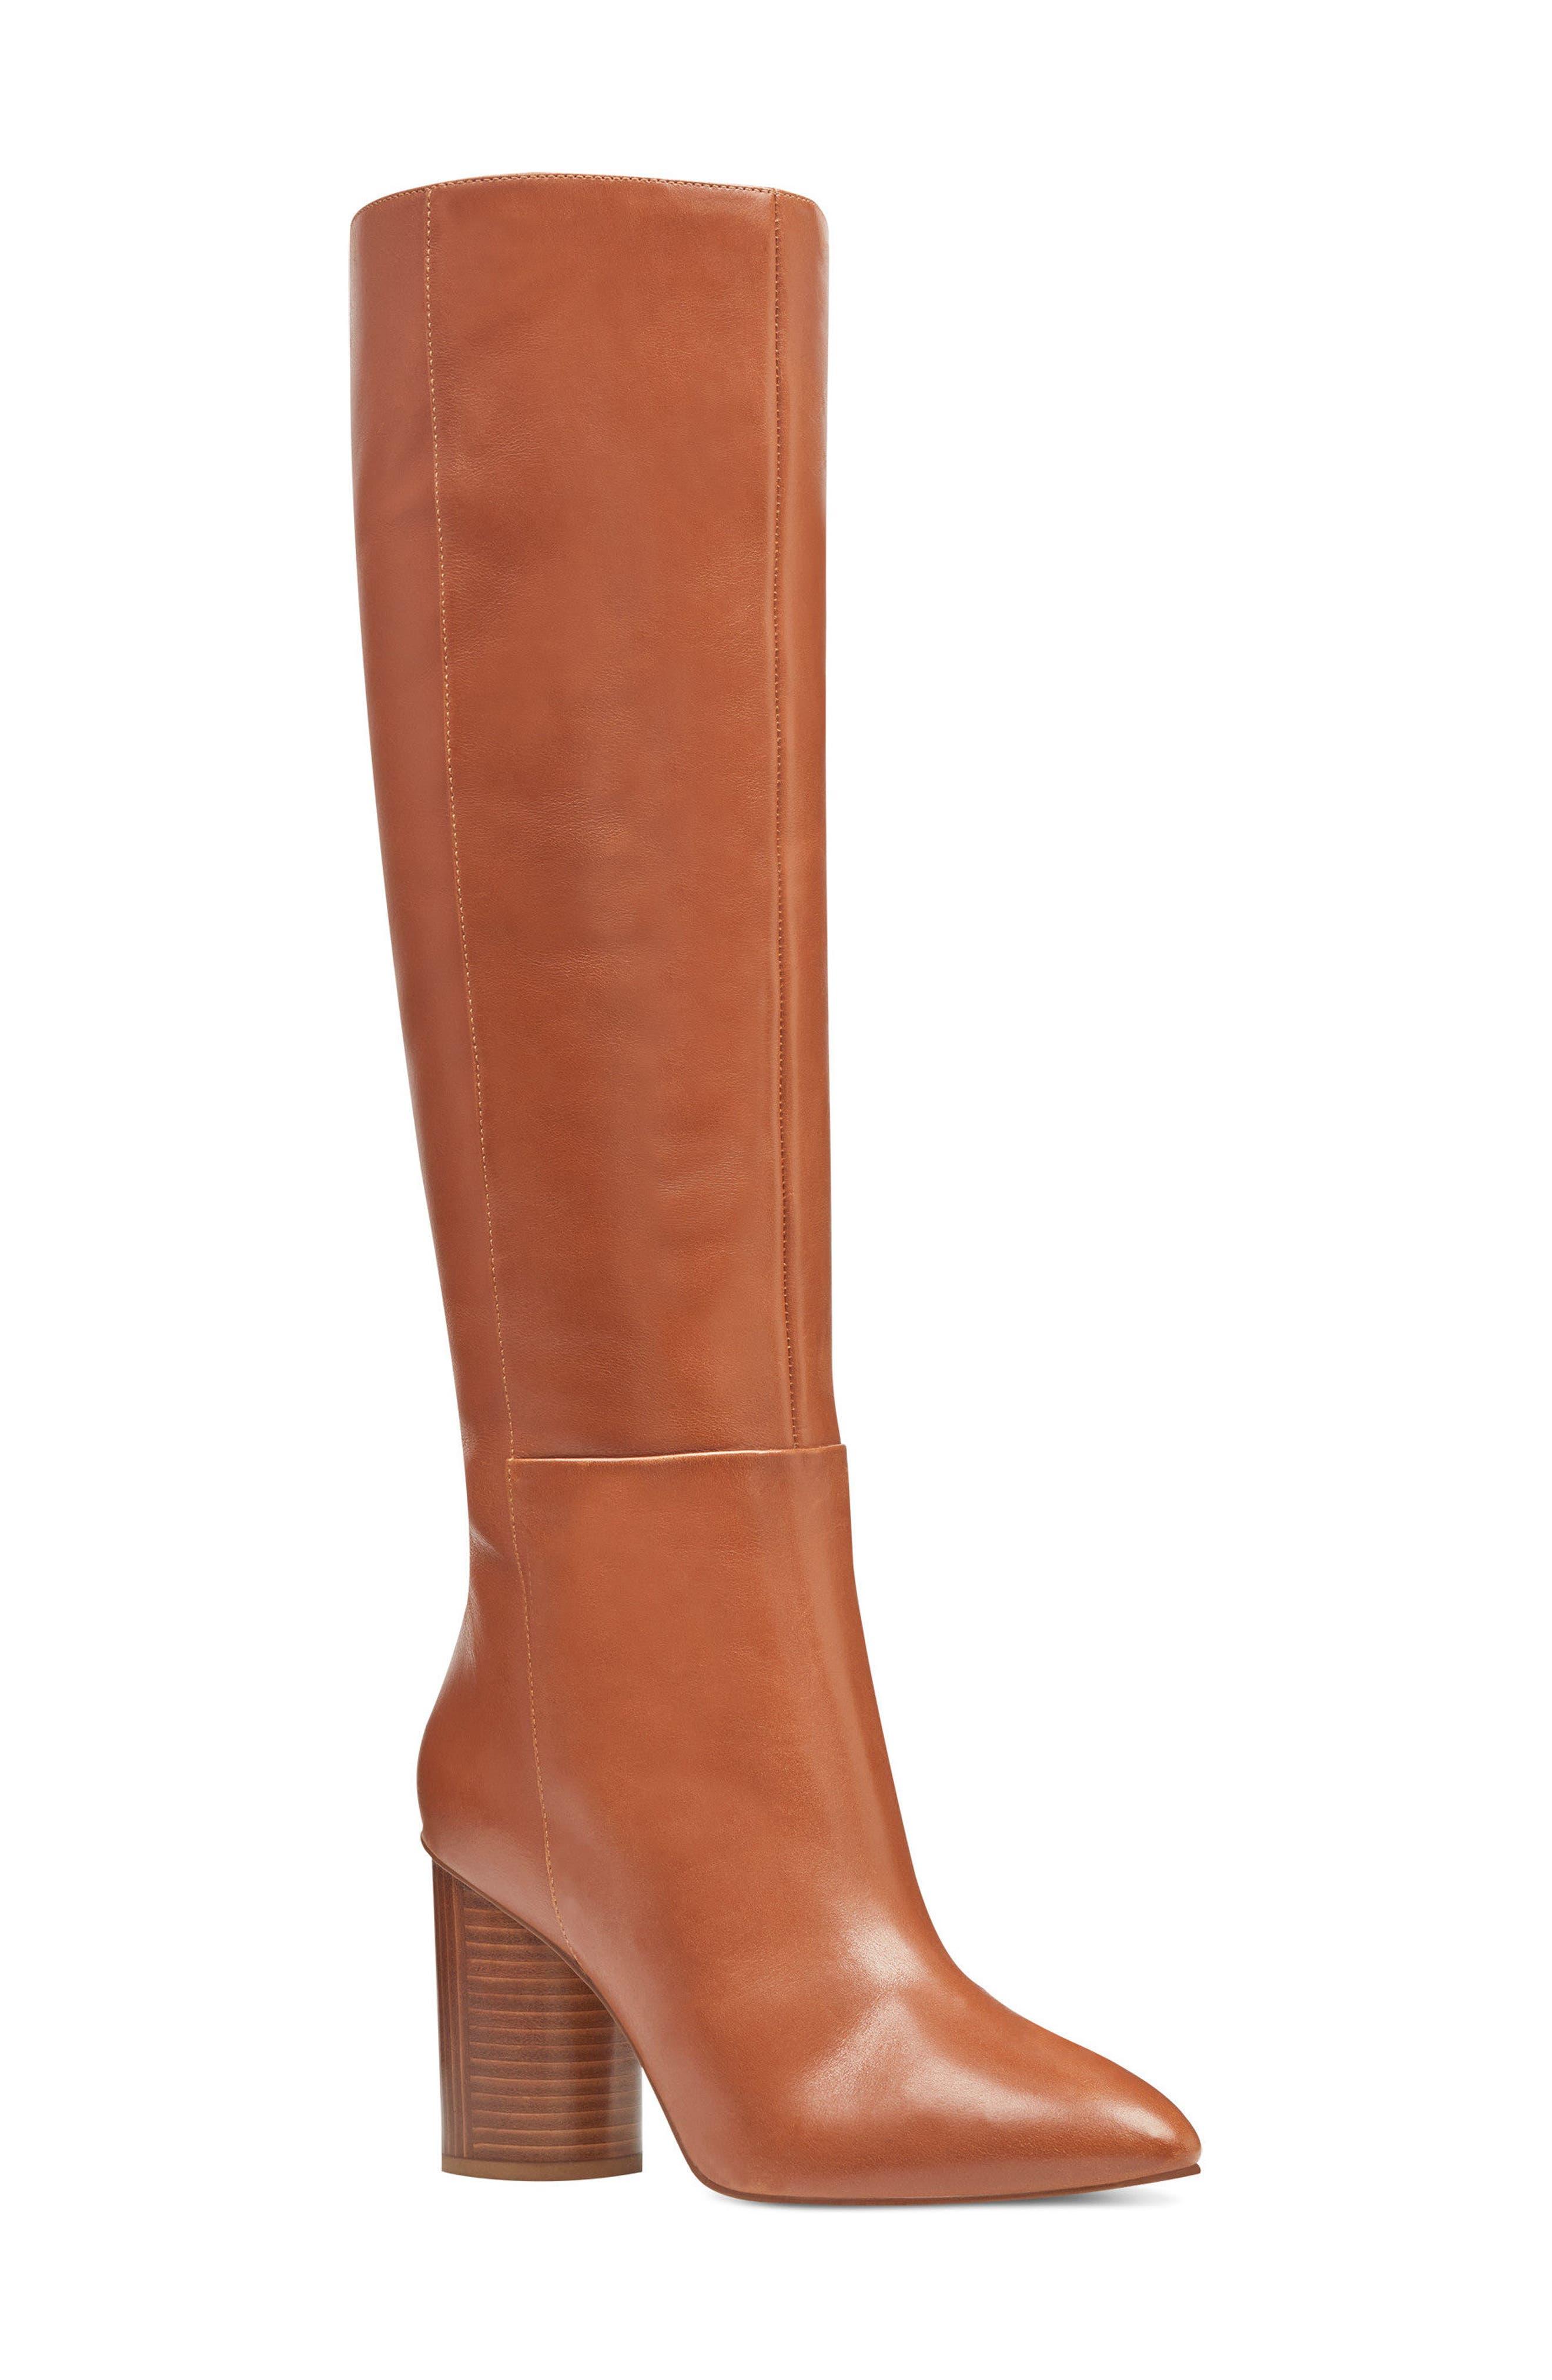 Alternate Image 1 Selected - Nine West Christie Knee High Boot (Women)